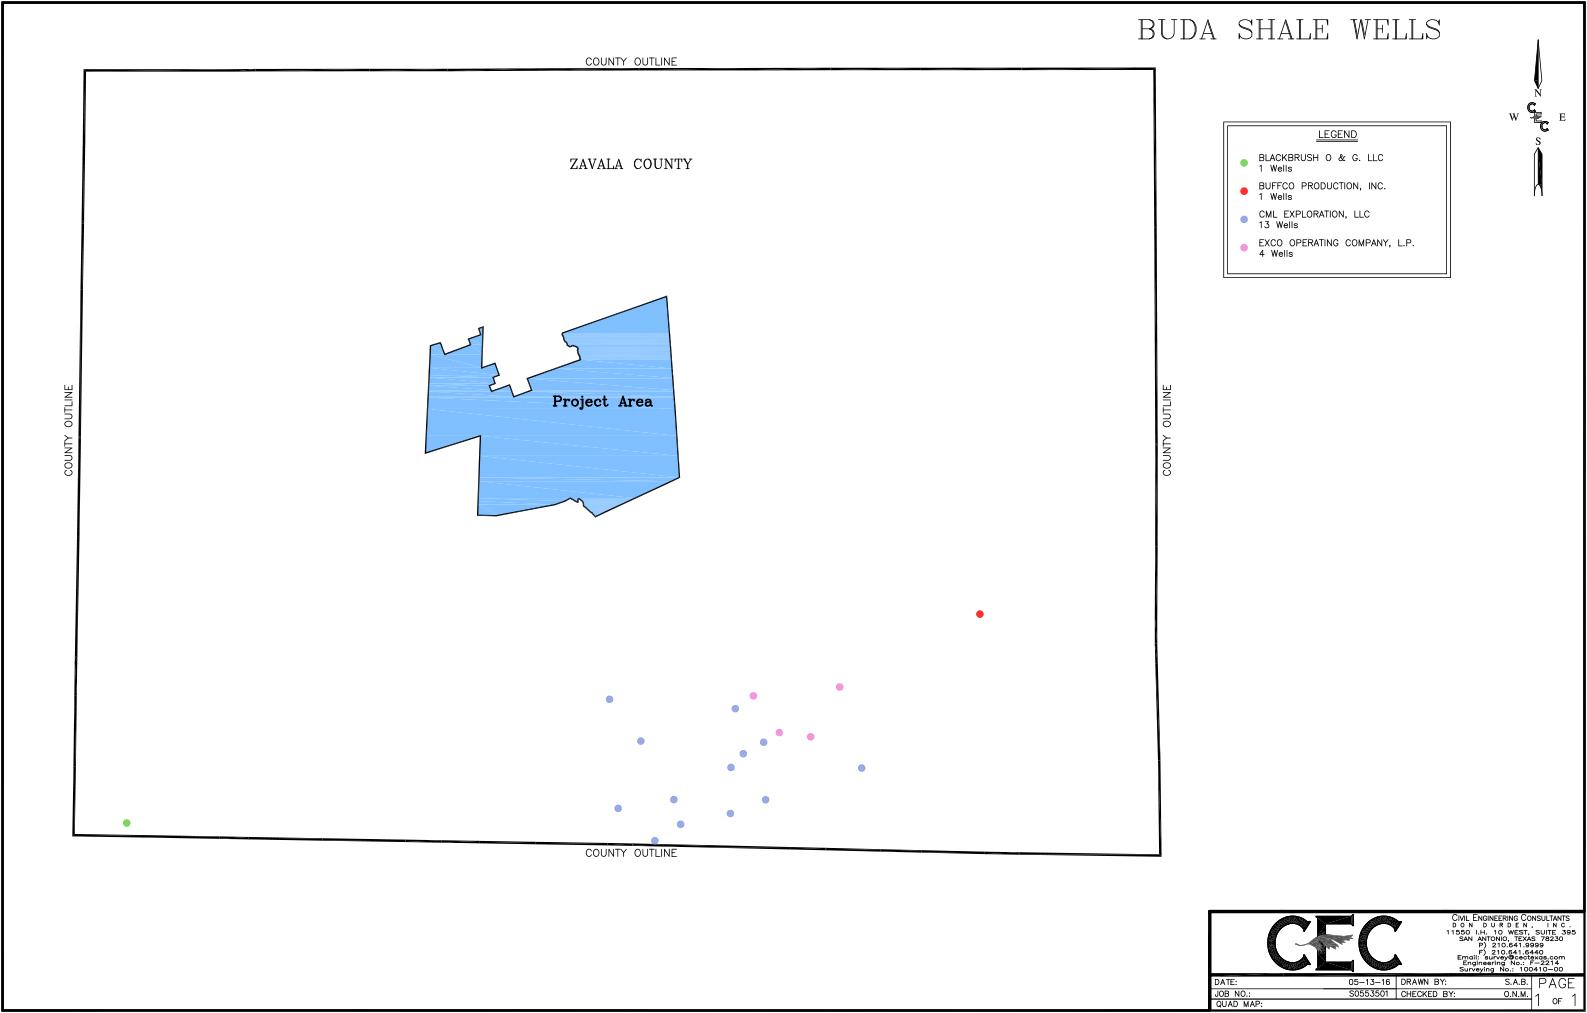 BUDA-ACTIVITY-ZAVALA-COUNTY-MAP-5.jpg